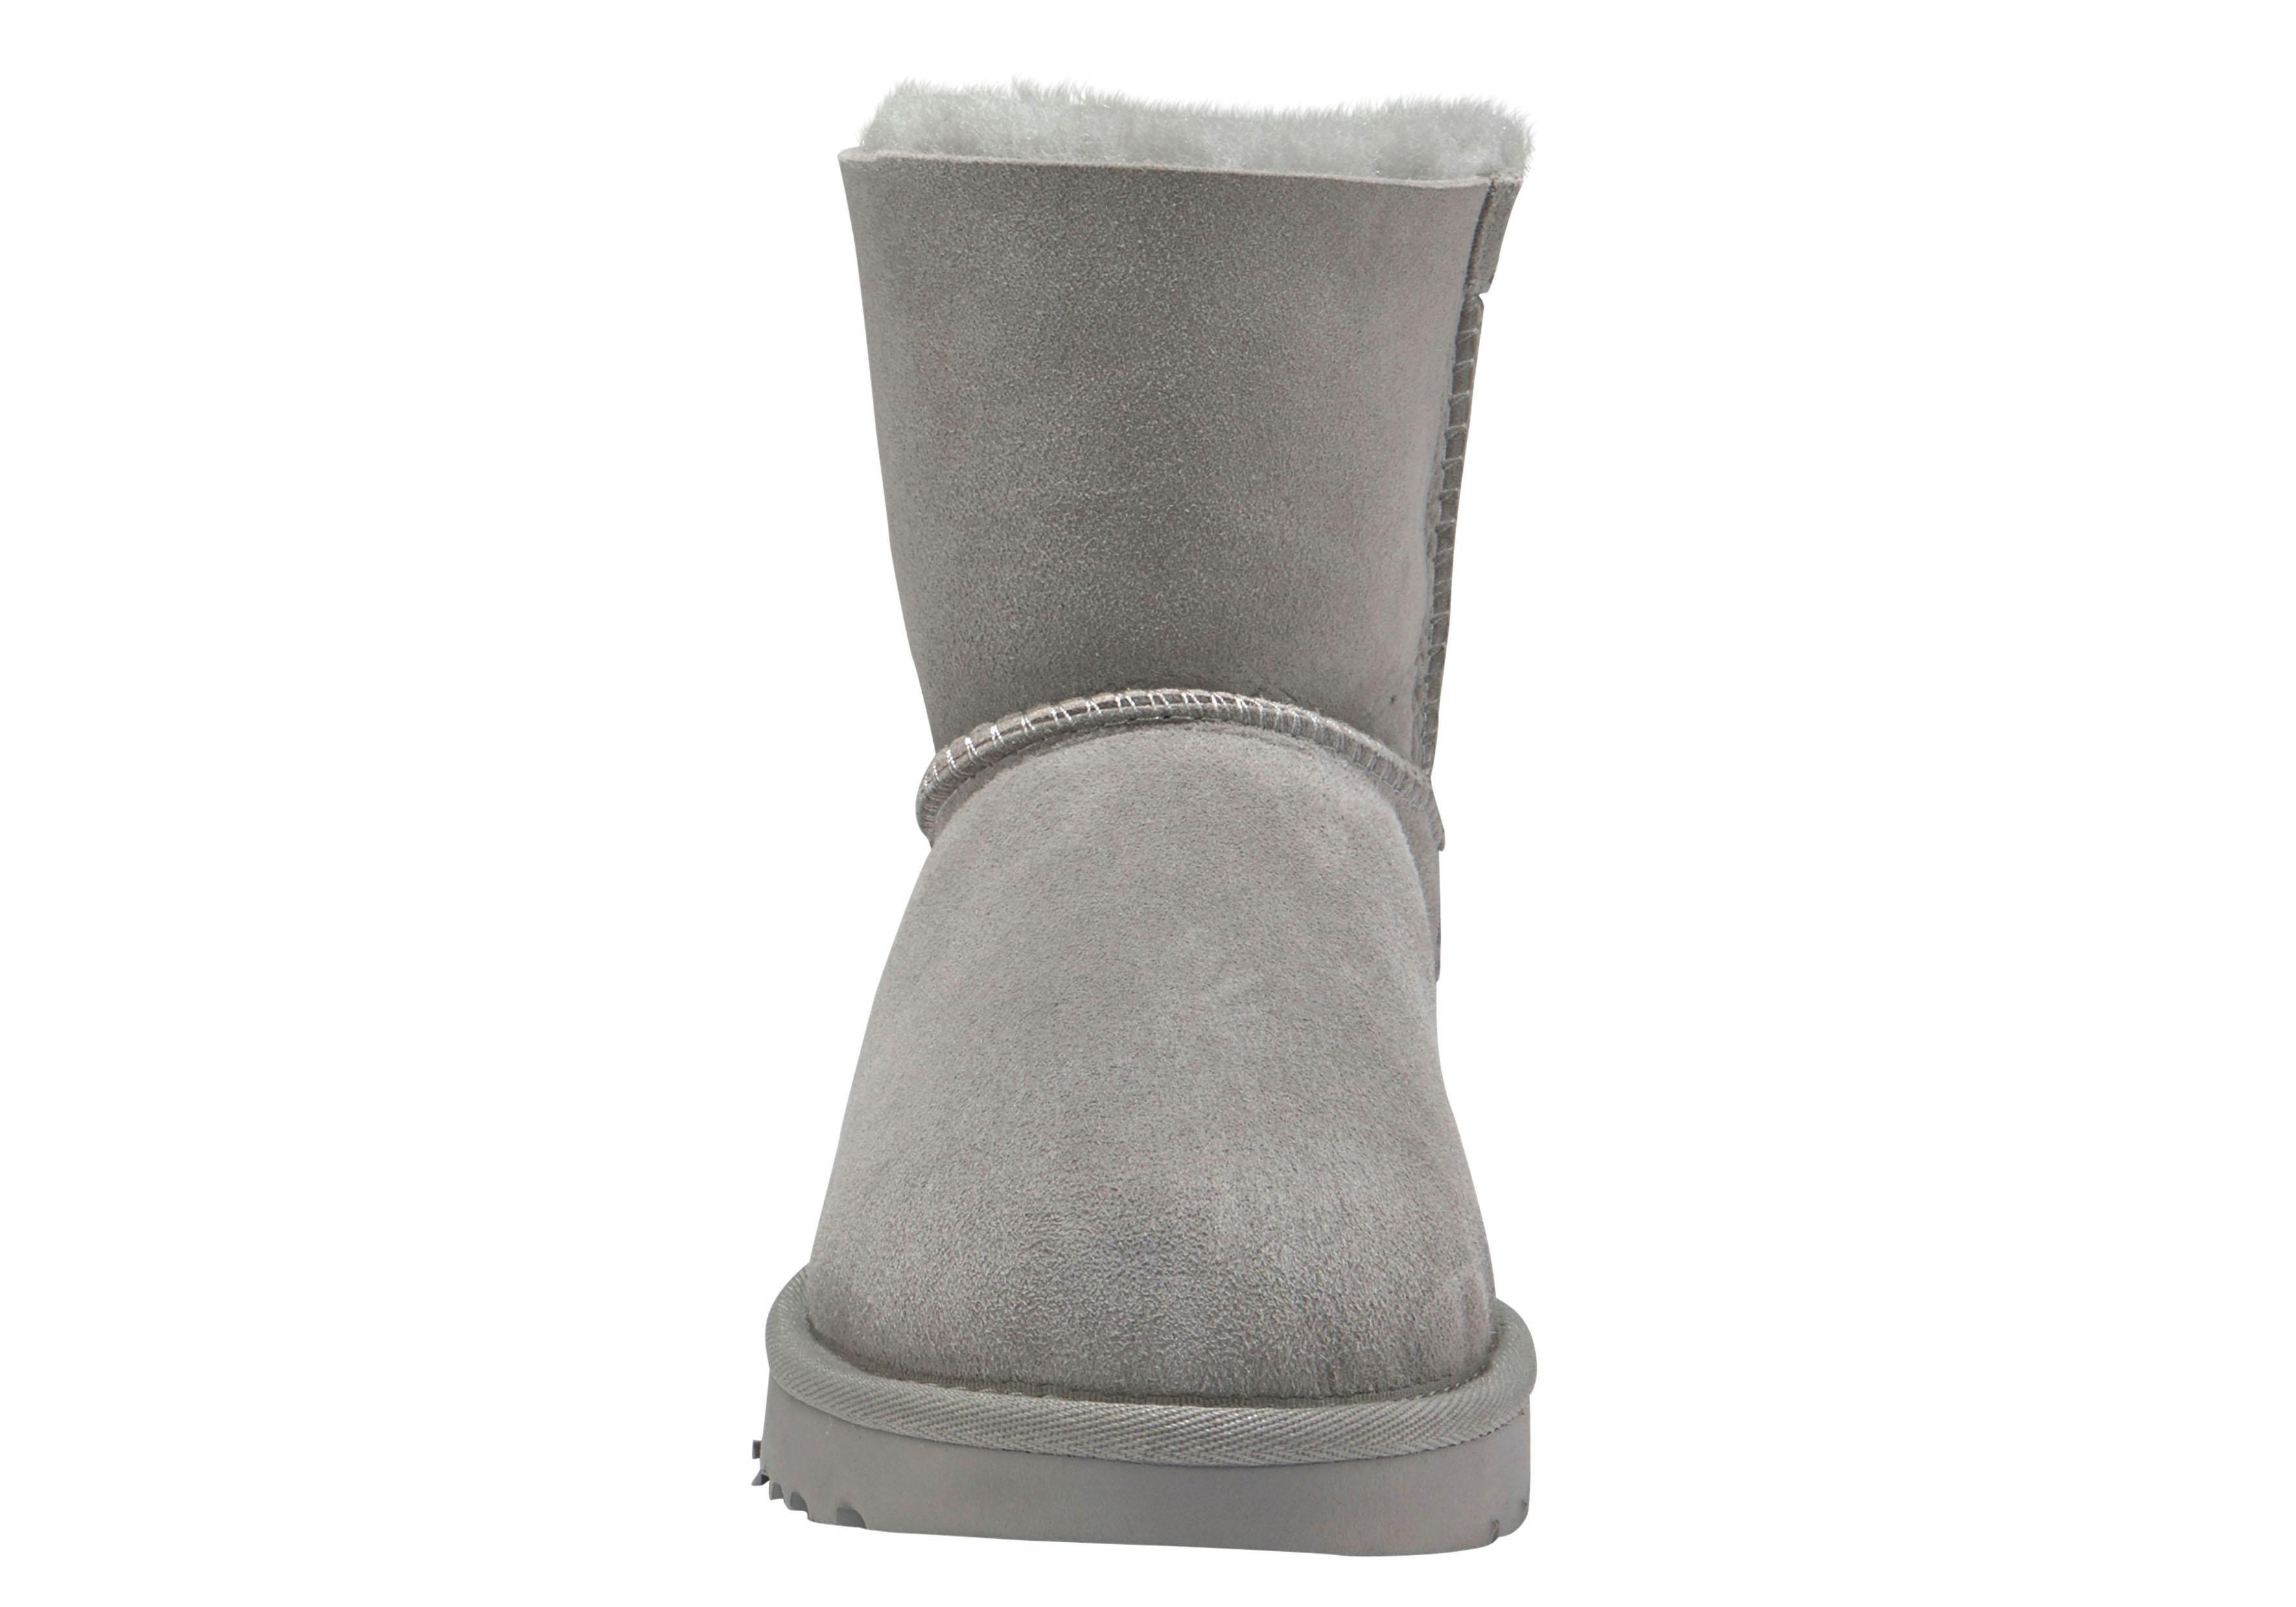 Bailey Snel Sluitingmini Online Gekocht Bow Ugg 2 Zonder Boots 35qcj4LRA